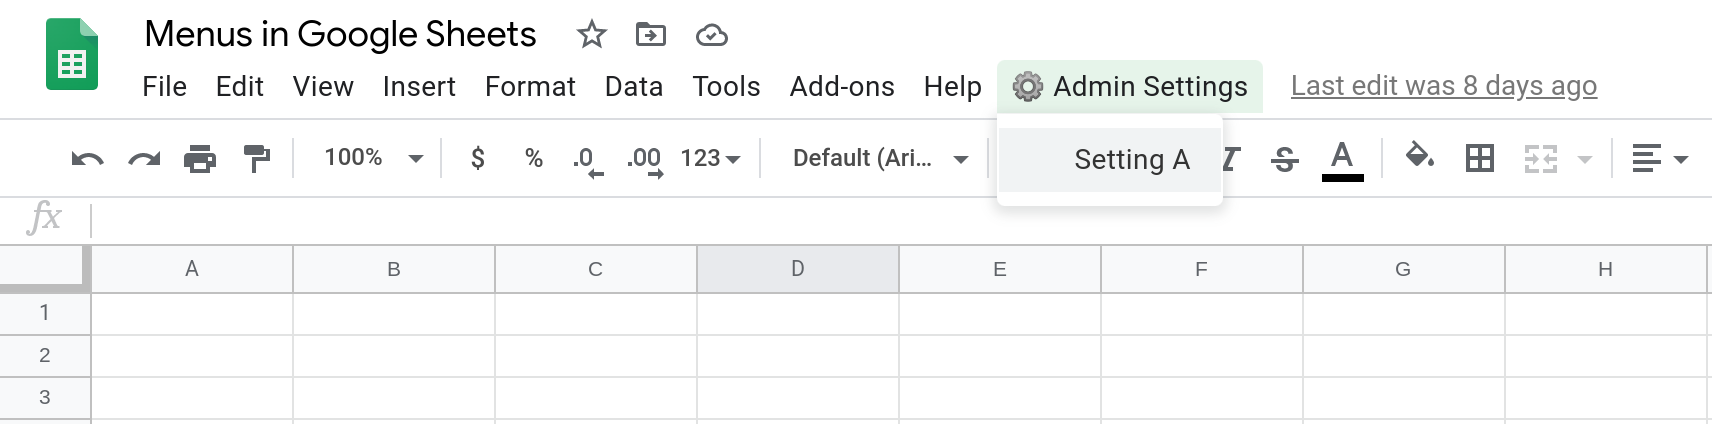 Screenshot of a Google Sheets spreadsheet showing a custom menu with a single menu item.